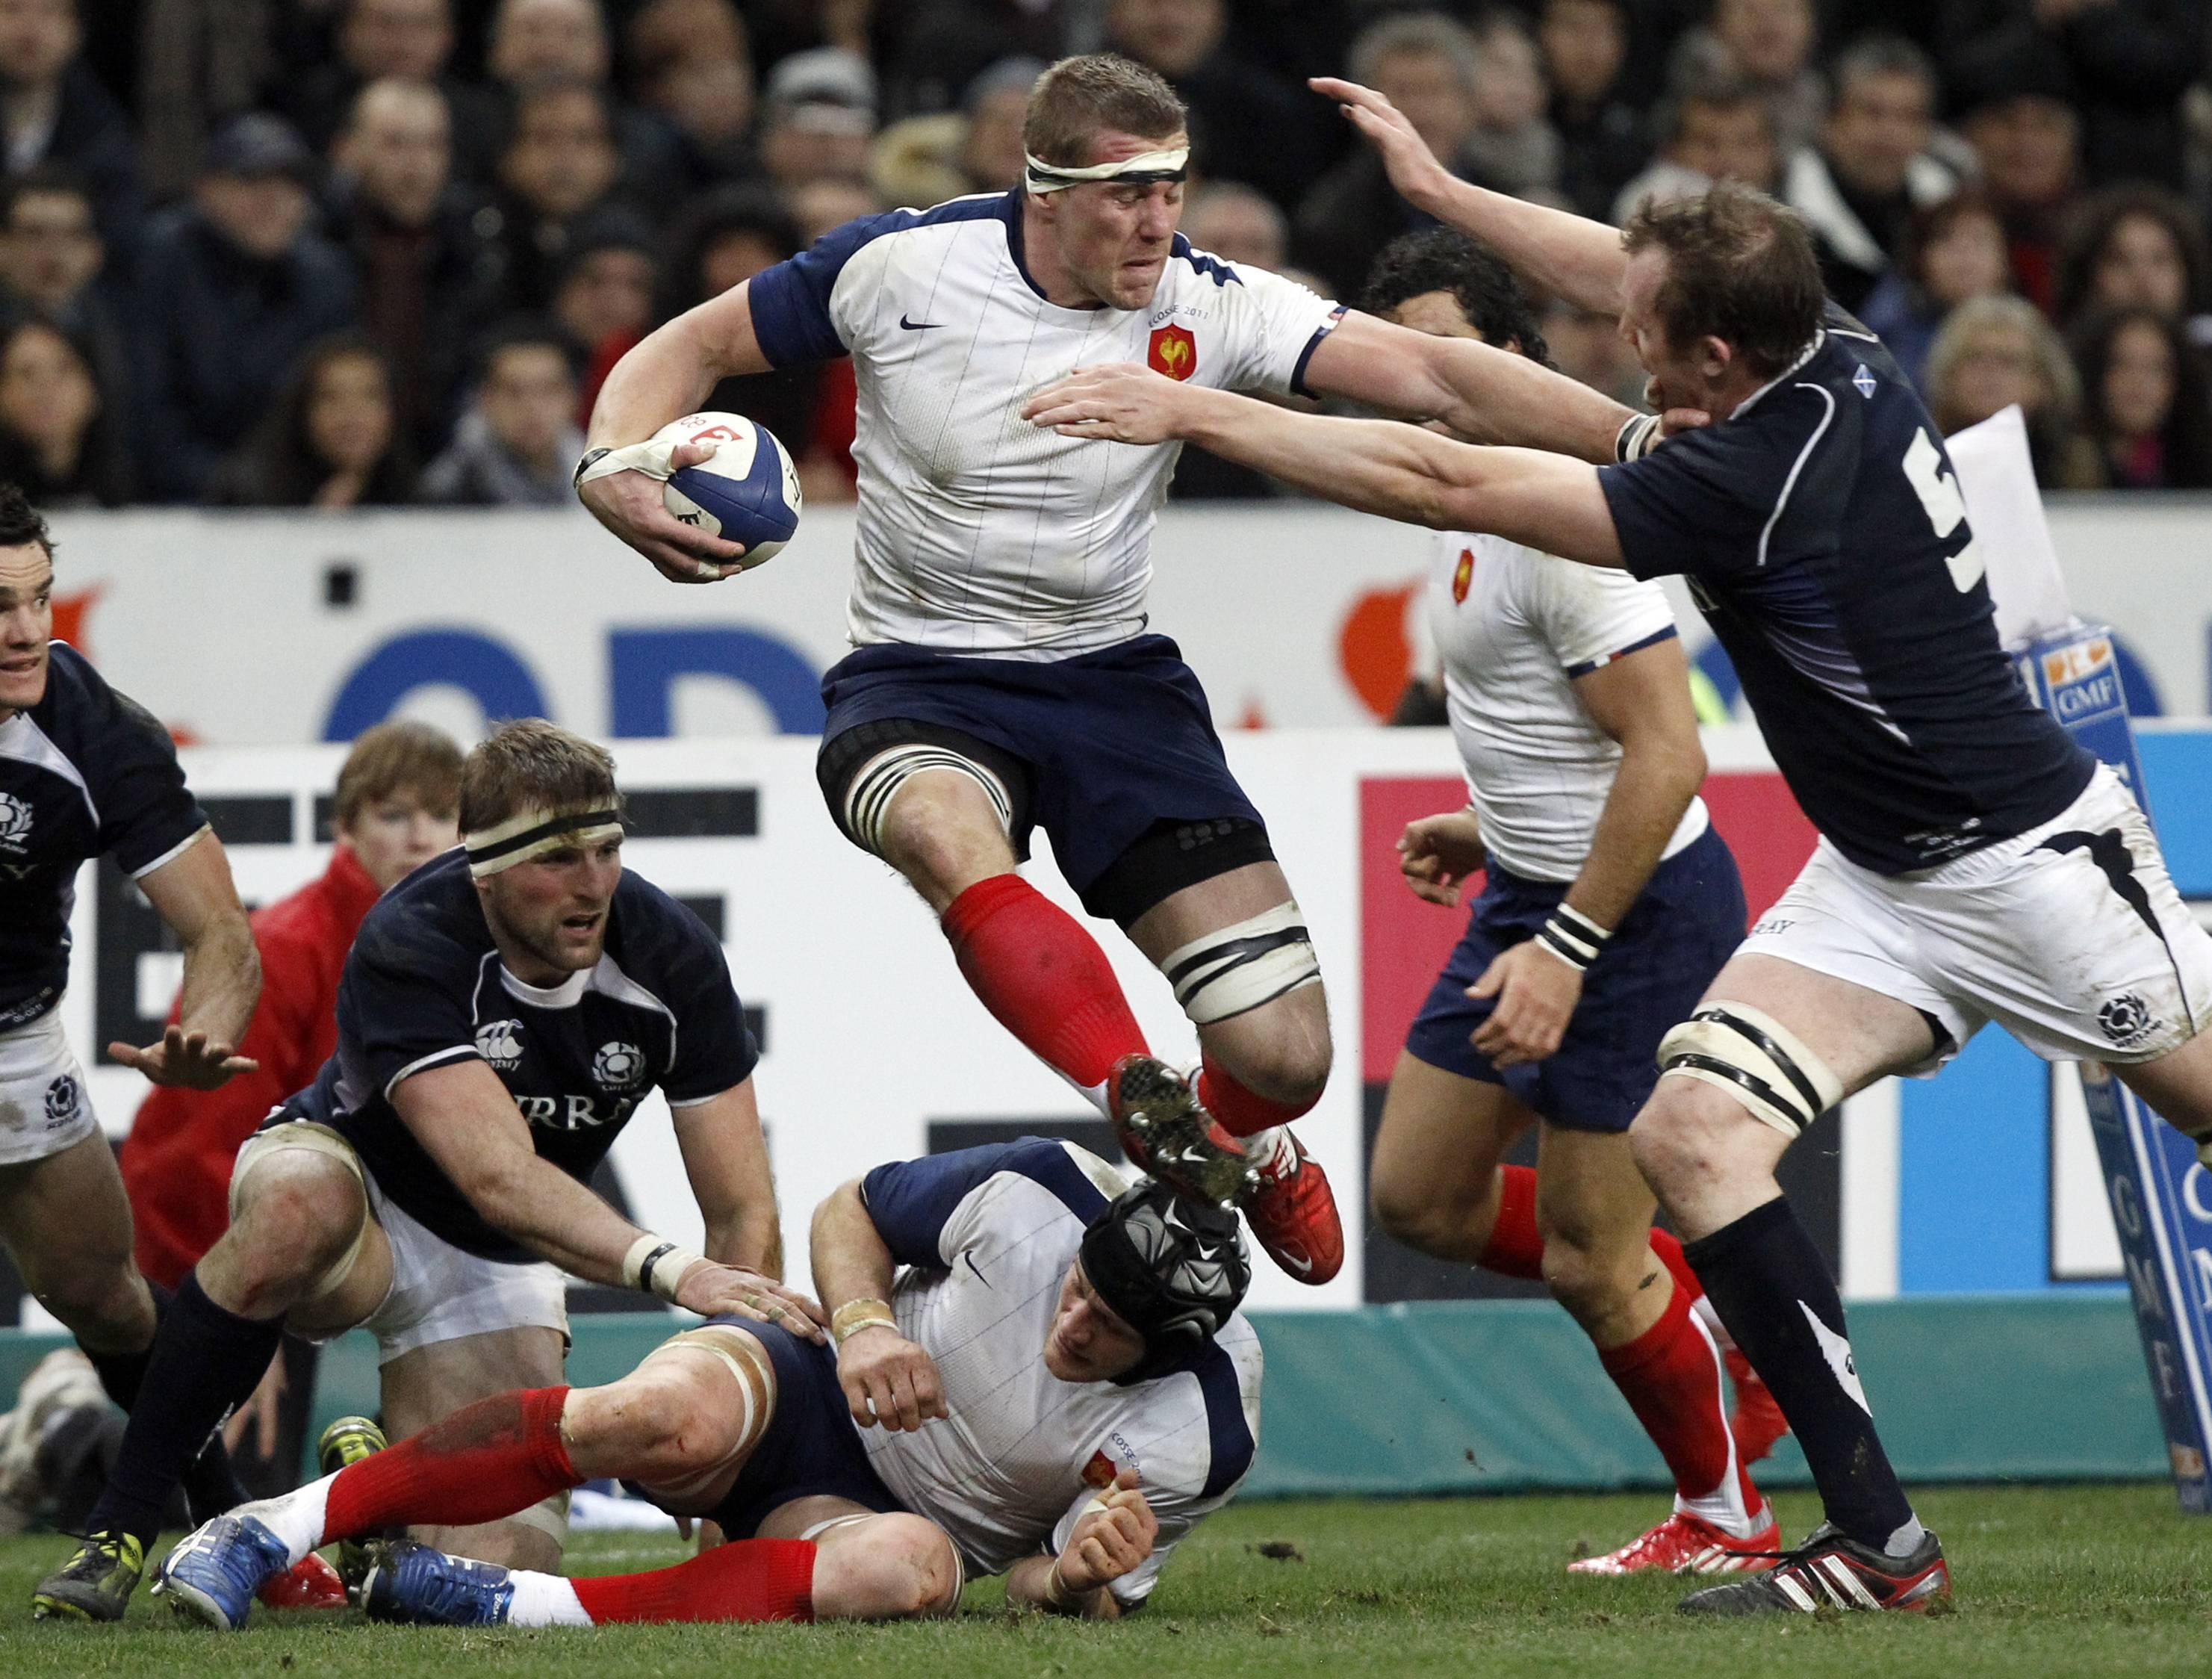 Imanol harinordoquy parrain de rugbyamateur on for Interieur sport rugby